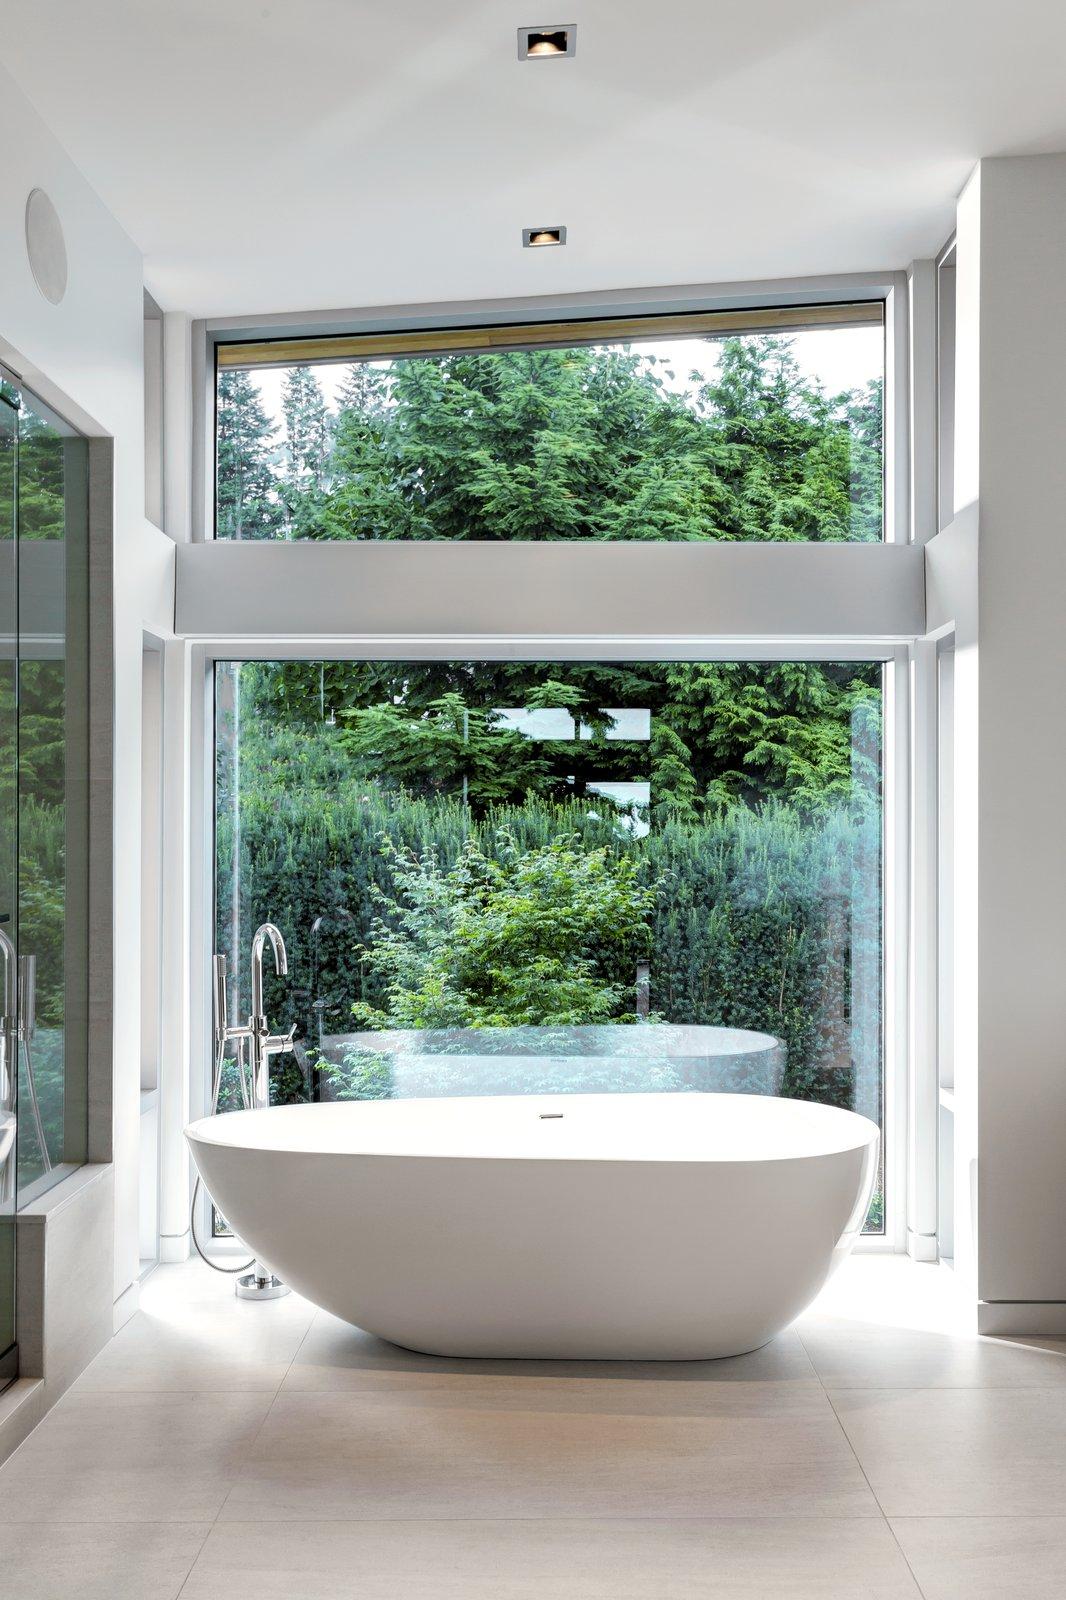 Garden Wall Residence, master bathtub  Garden Wall Residence by Garret Cord Werner